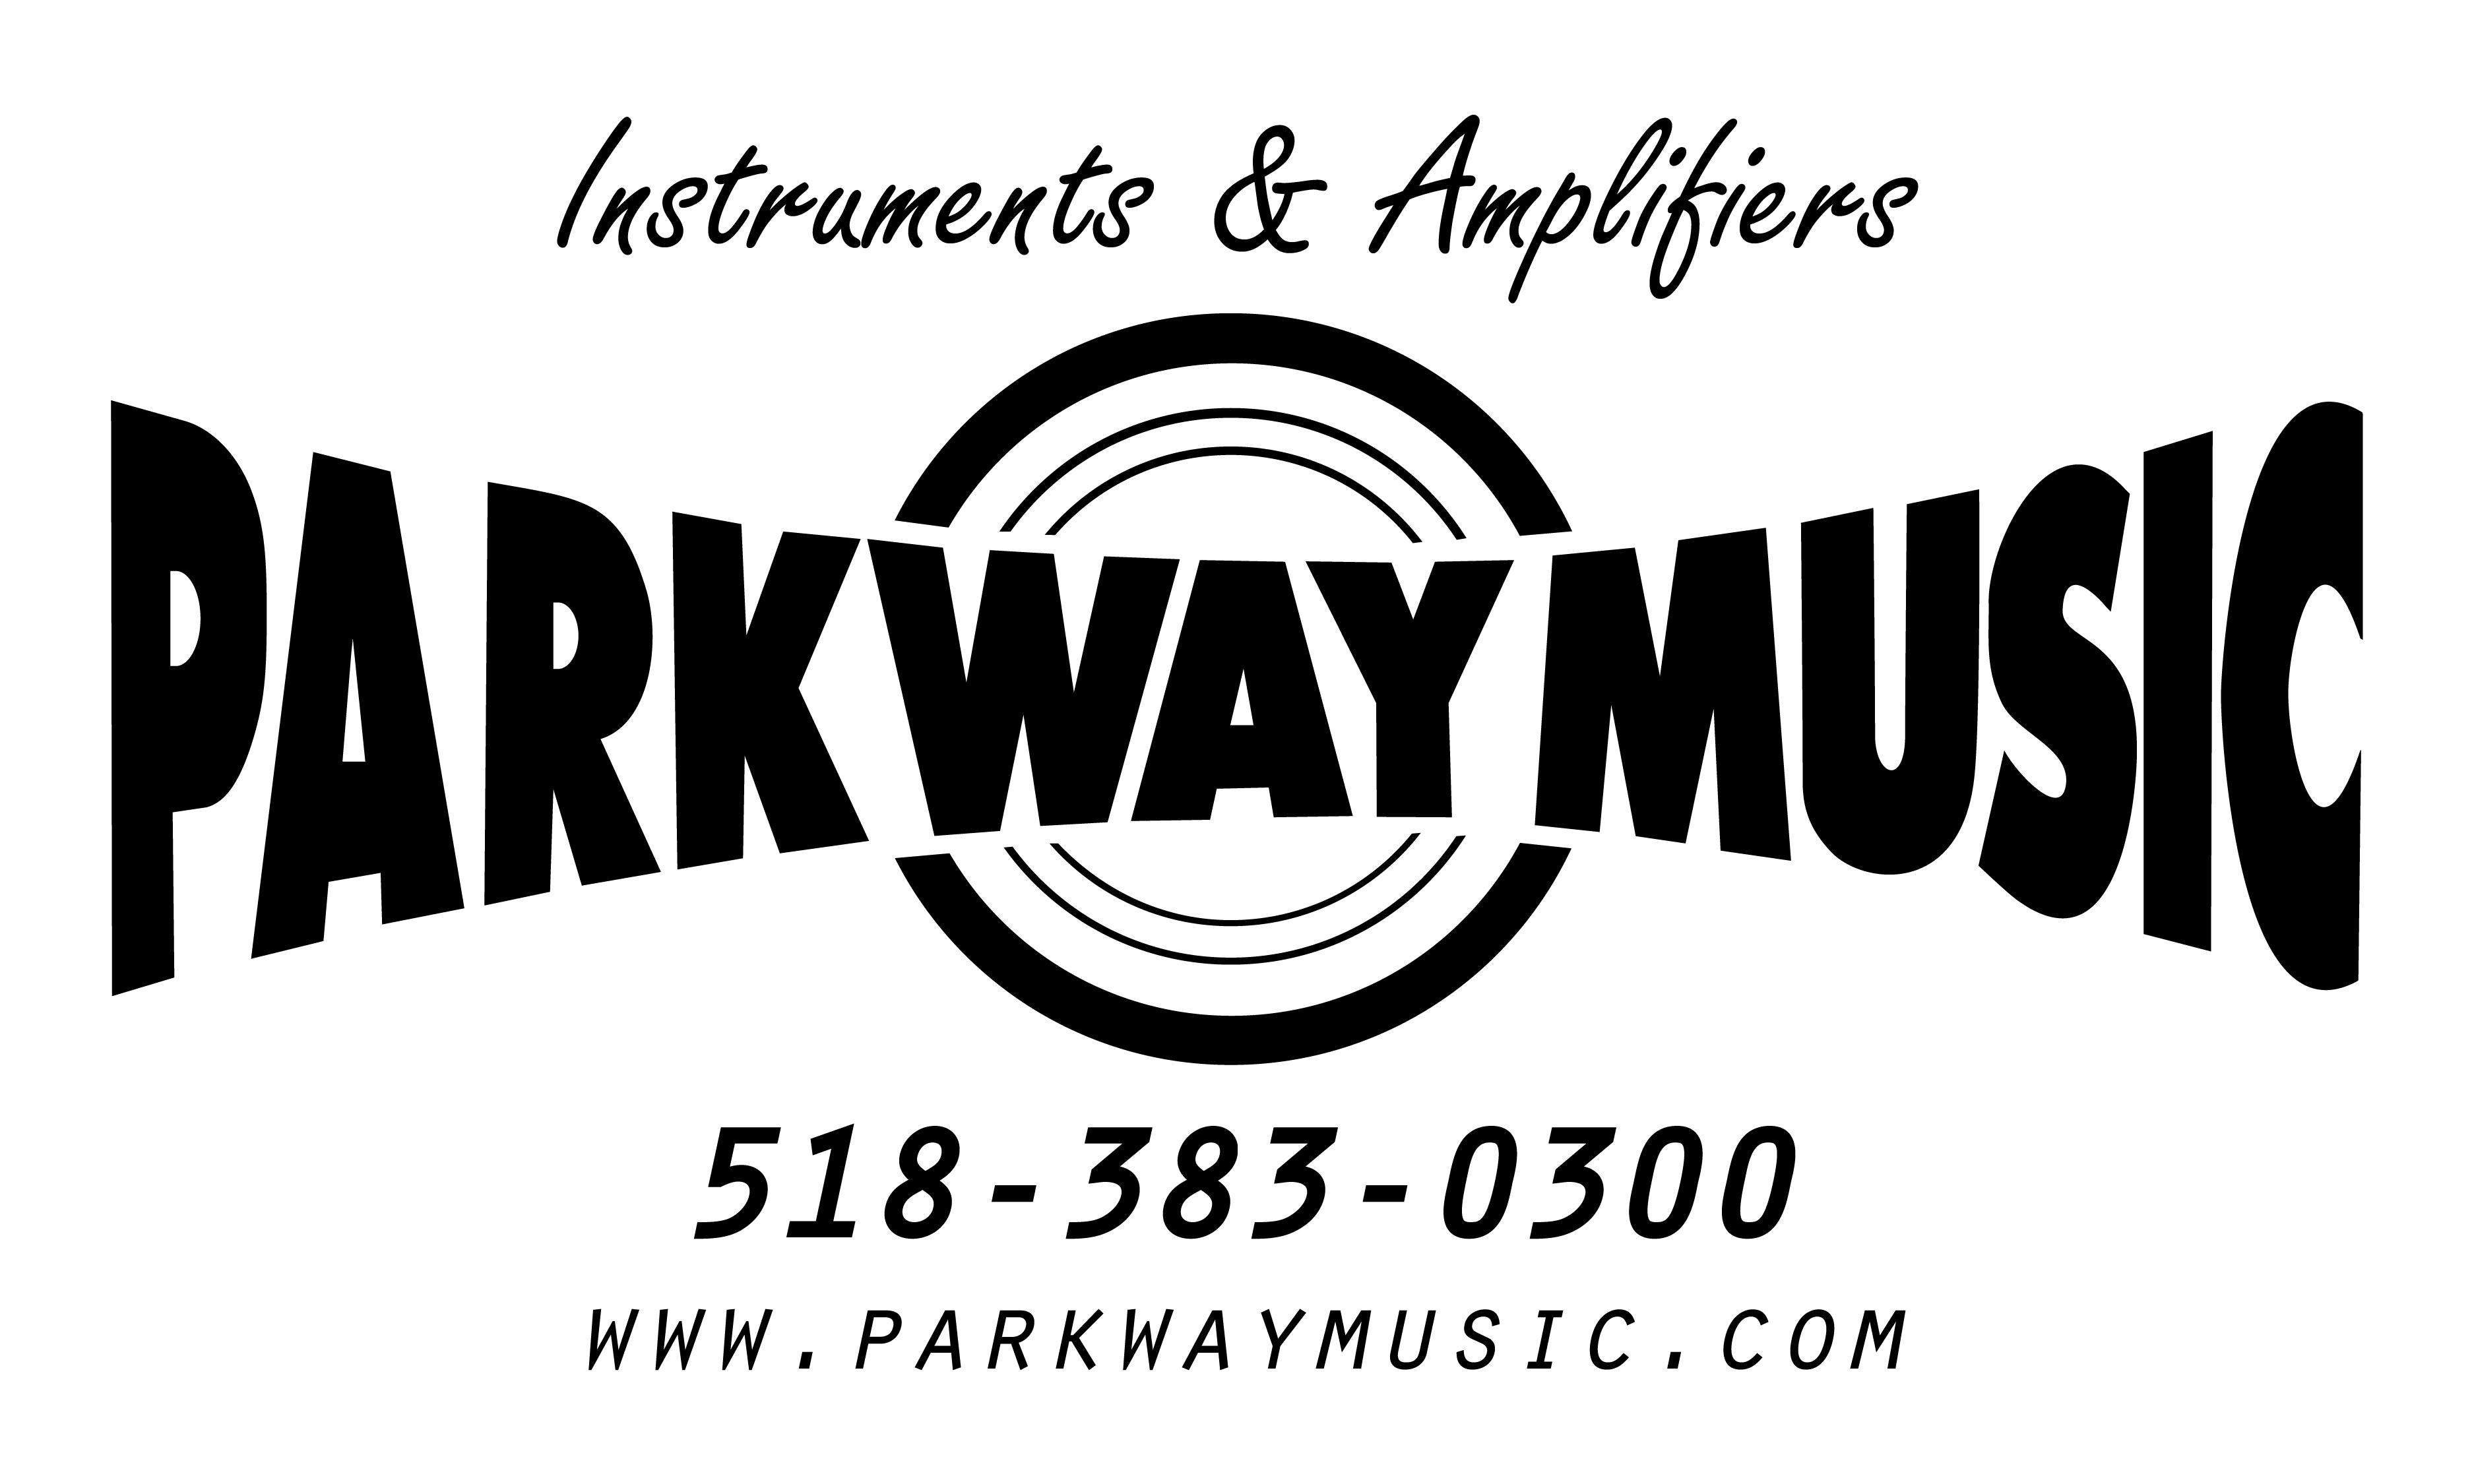 Parkway -